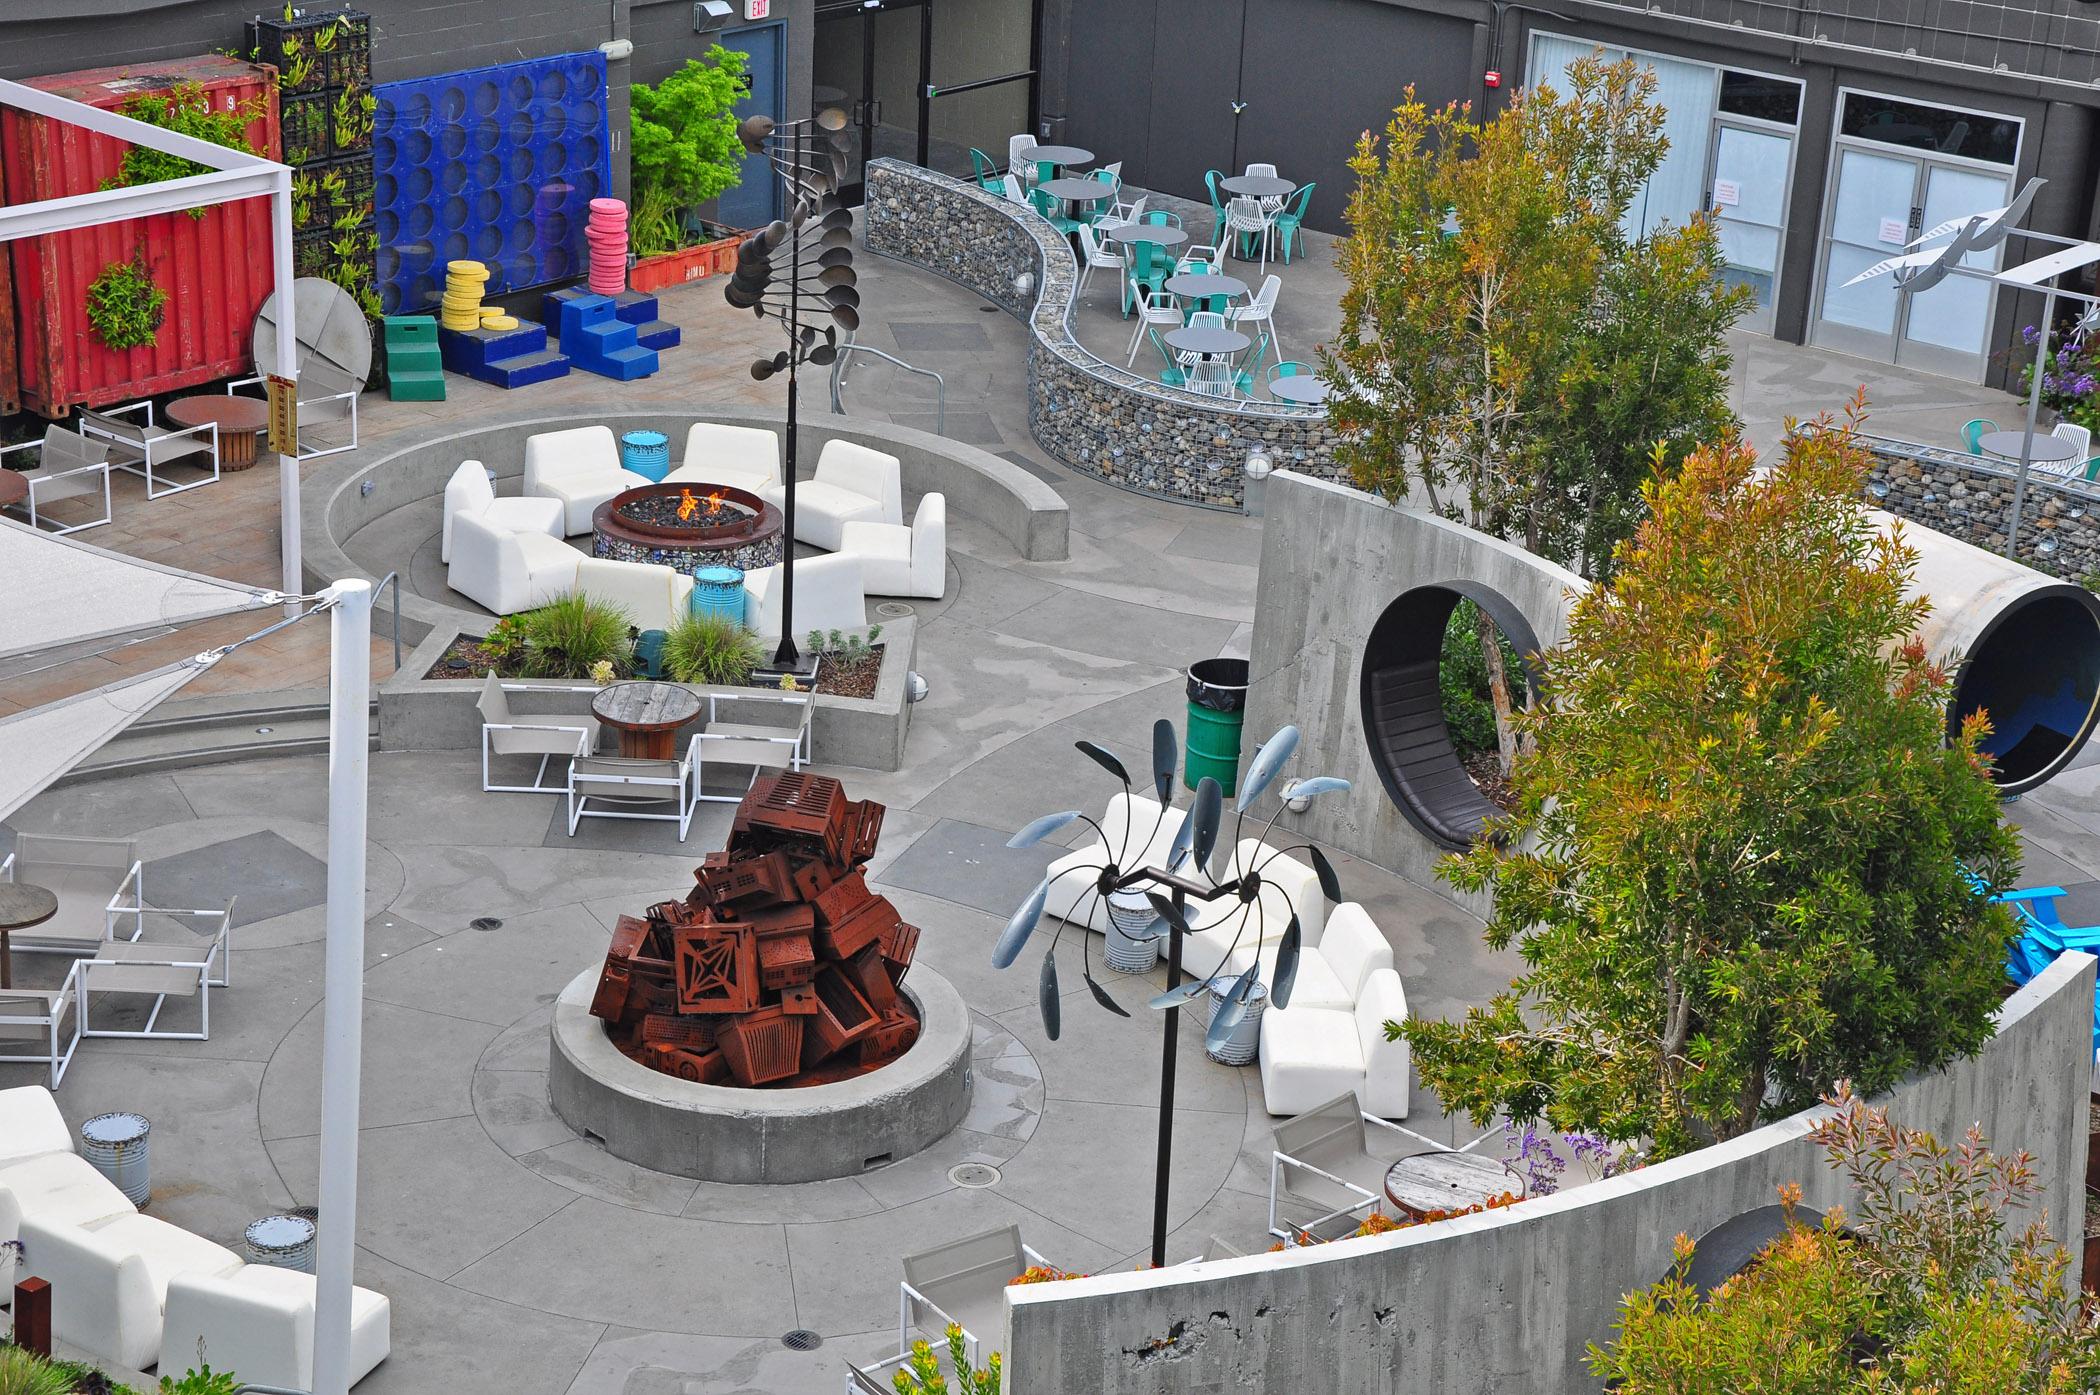 4. The Yard at Hotel Zephyr